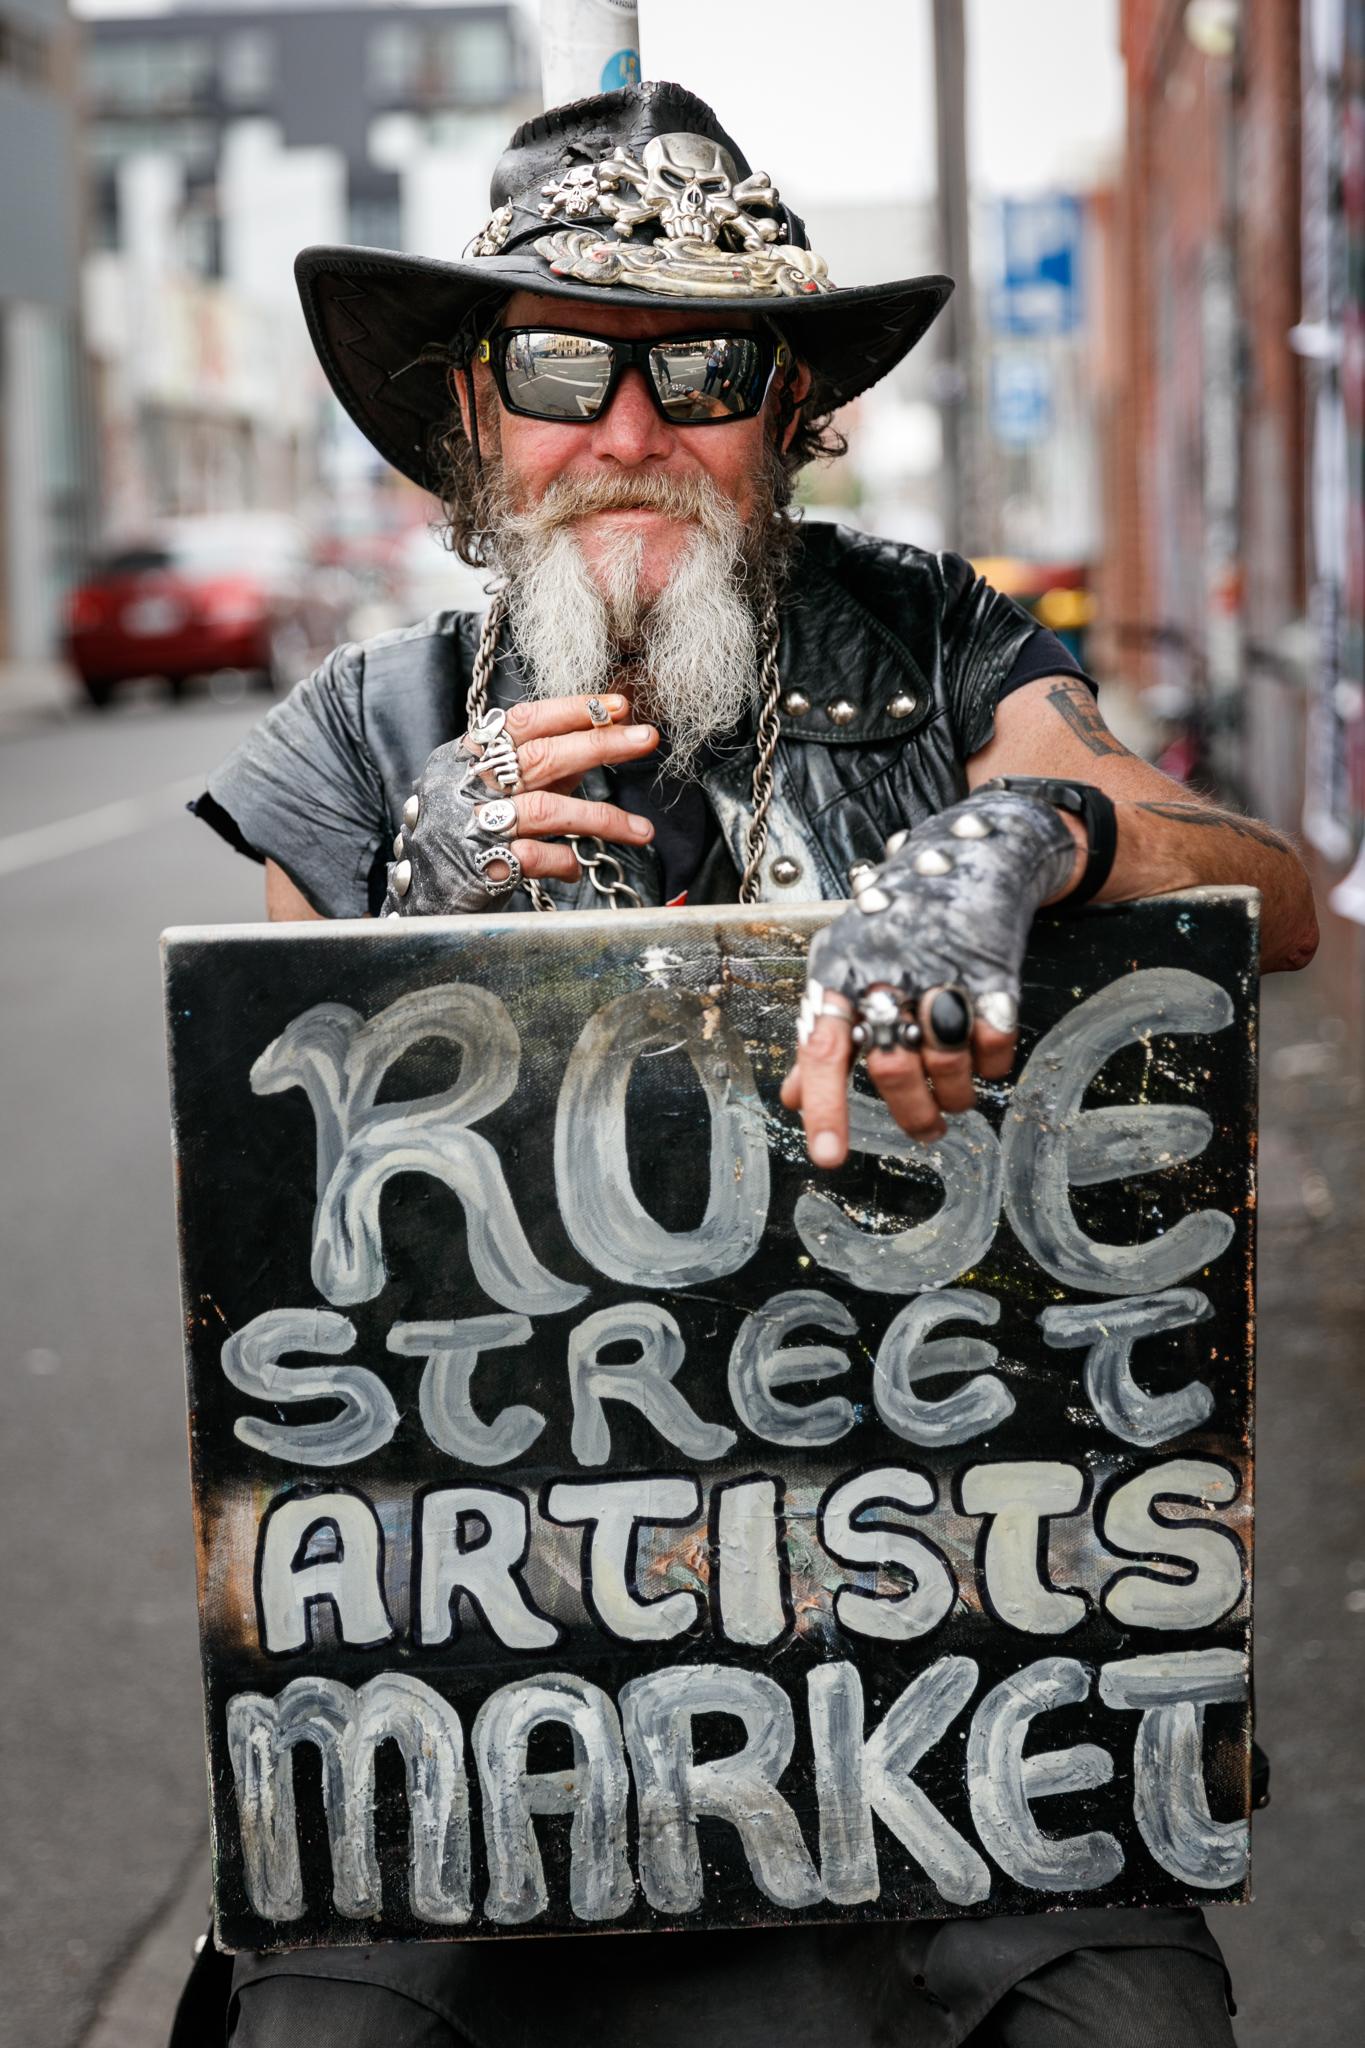 street-man-with-a-sign.jpg